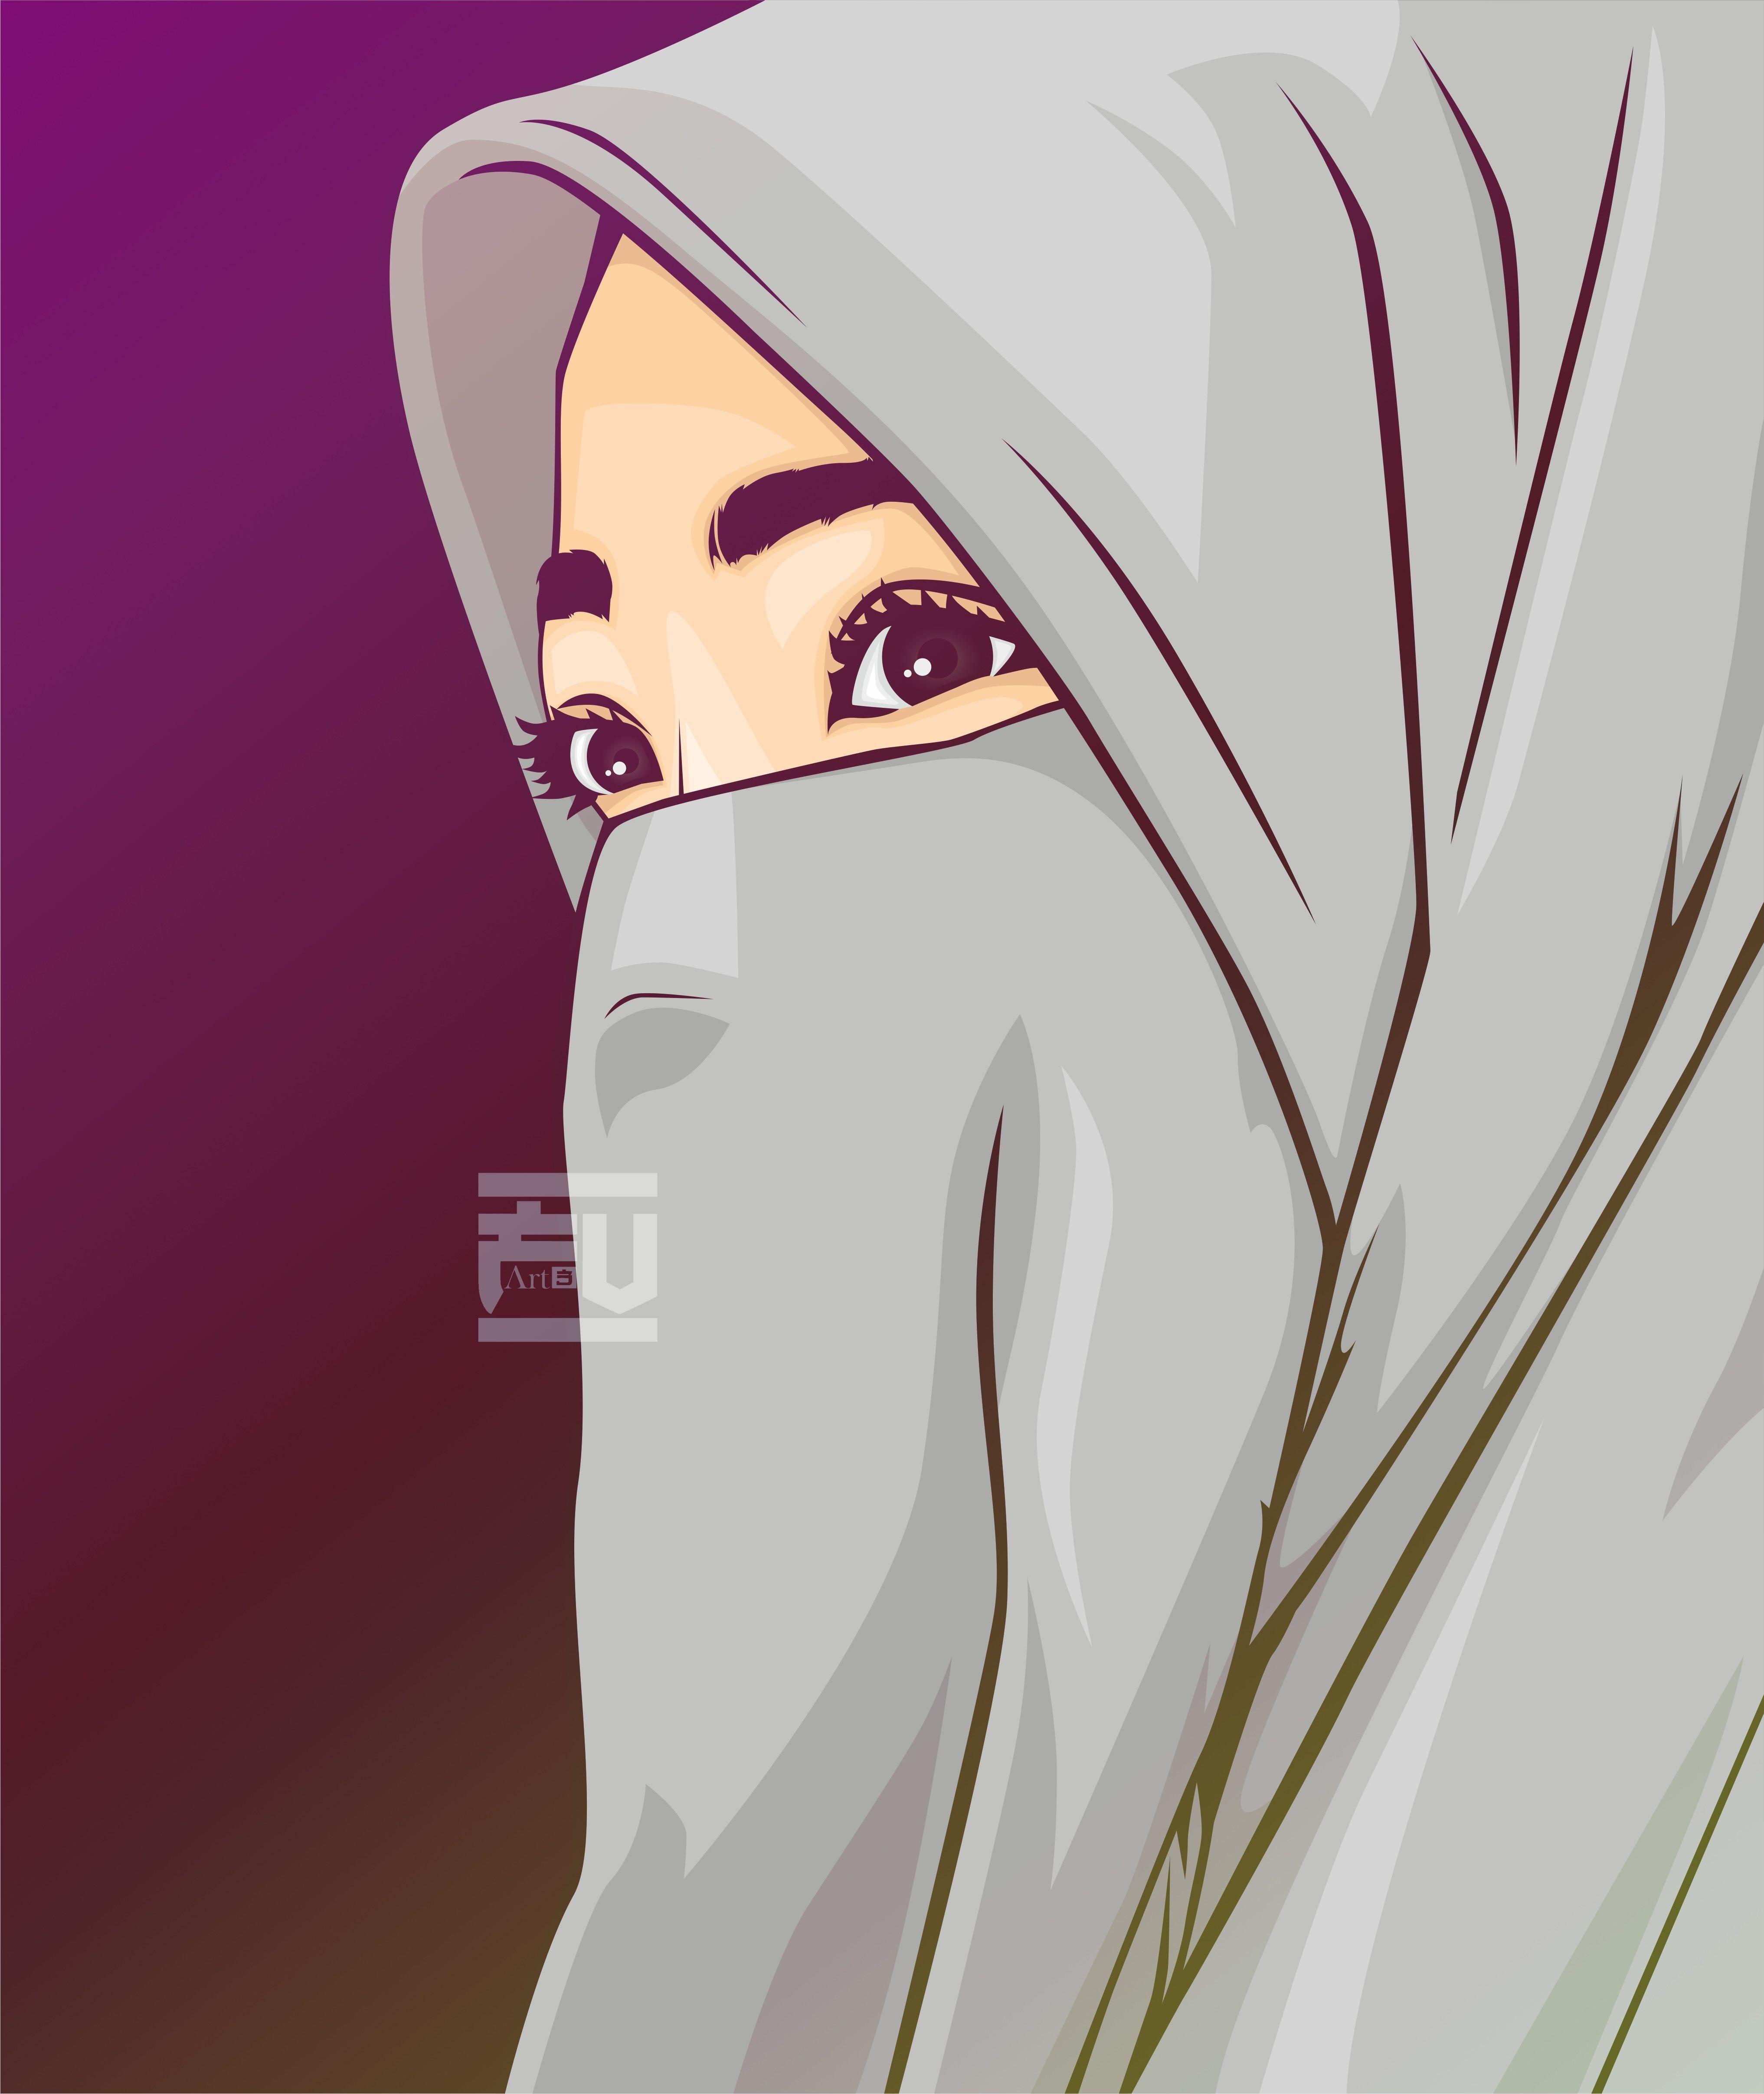 Unduh 850 Gambar Animasi Hijab Hd Paling Keren Kartun Gambar